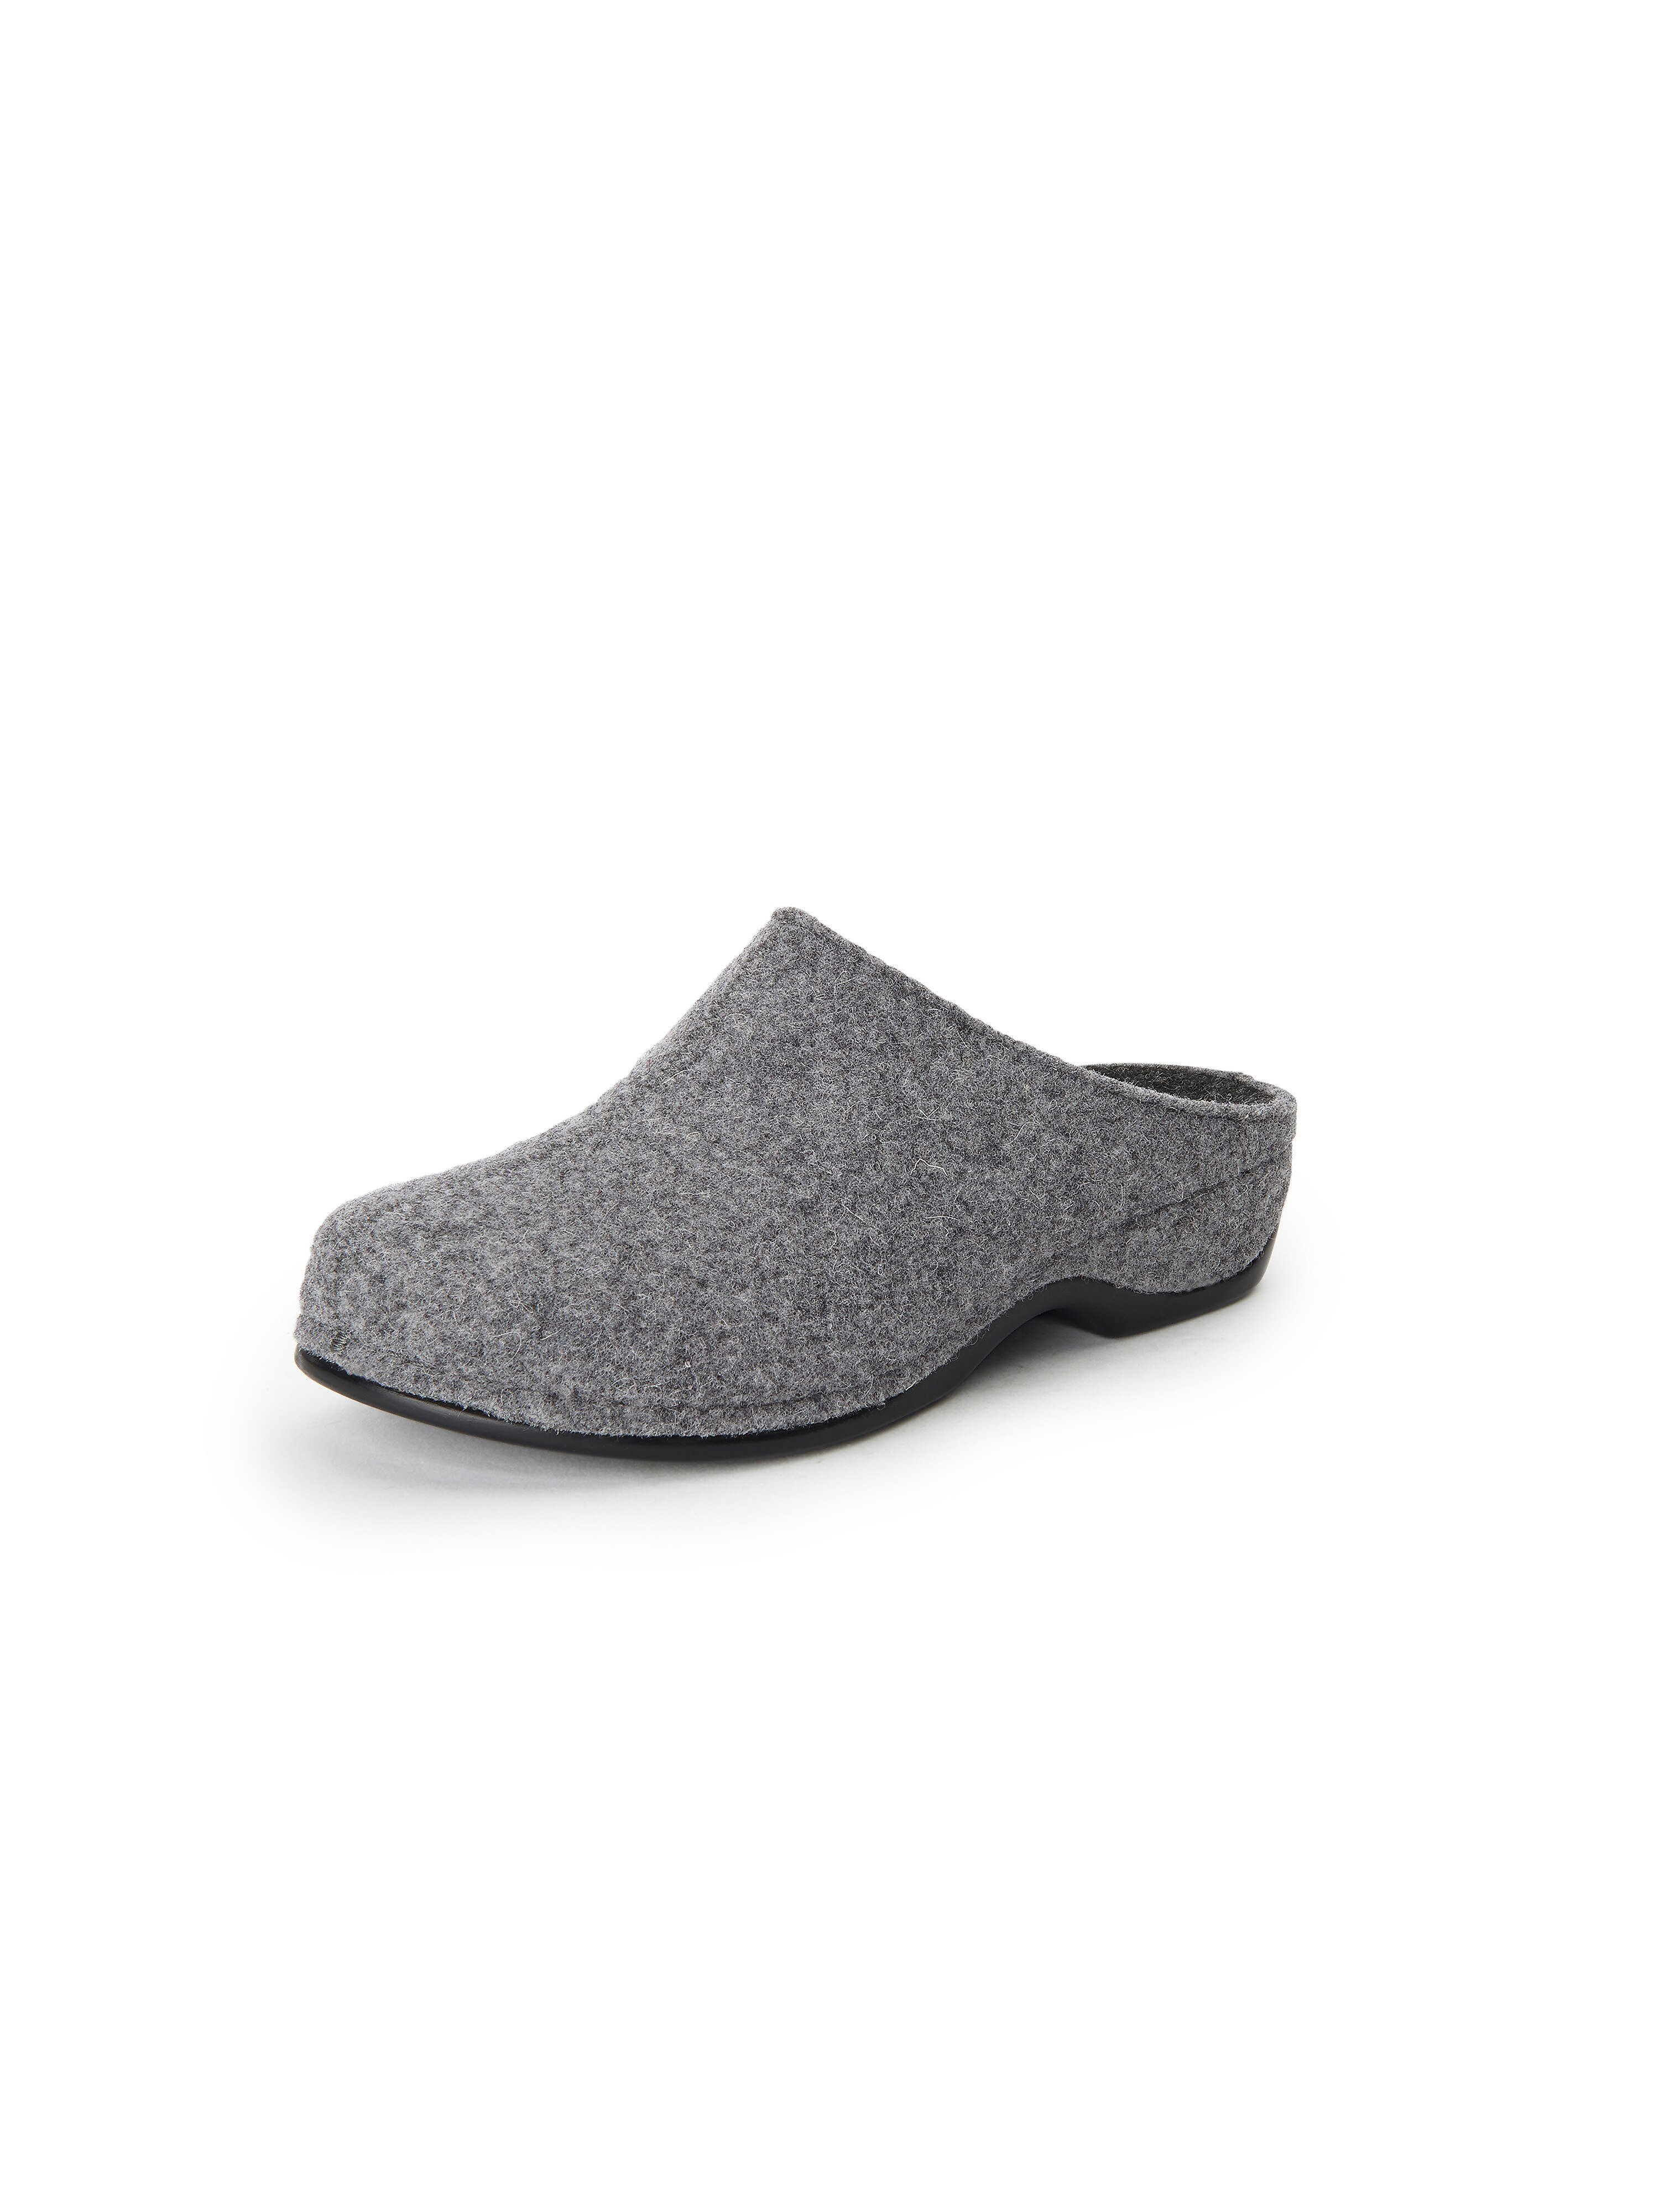 Pantoffels model Florina Van Berkemann Original grijs